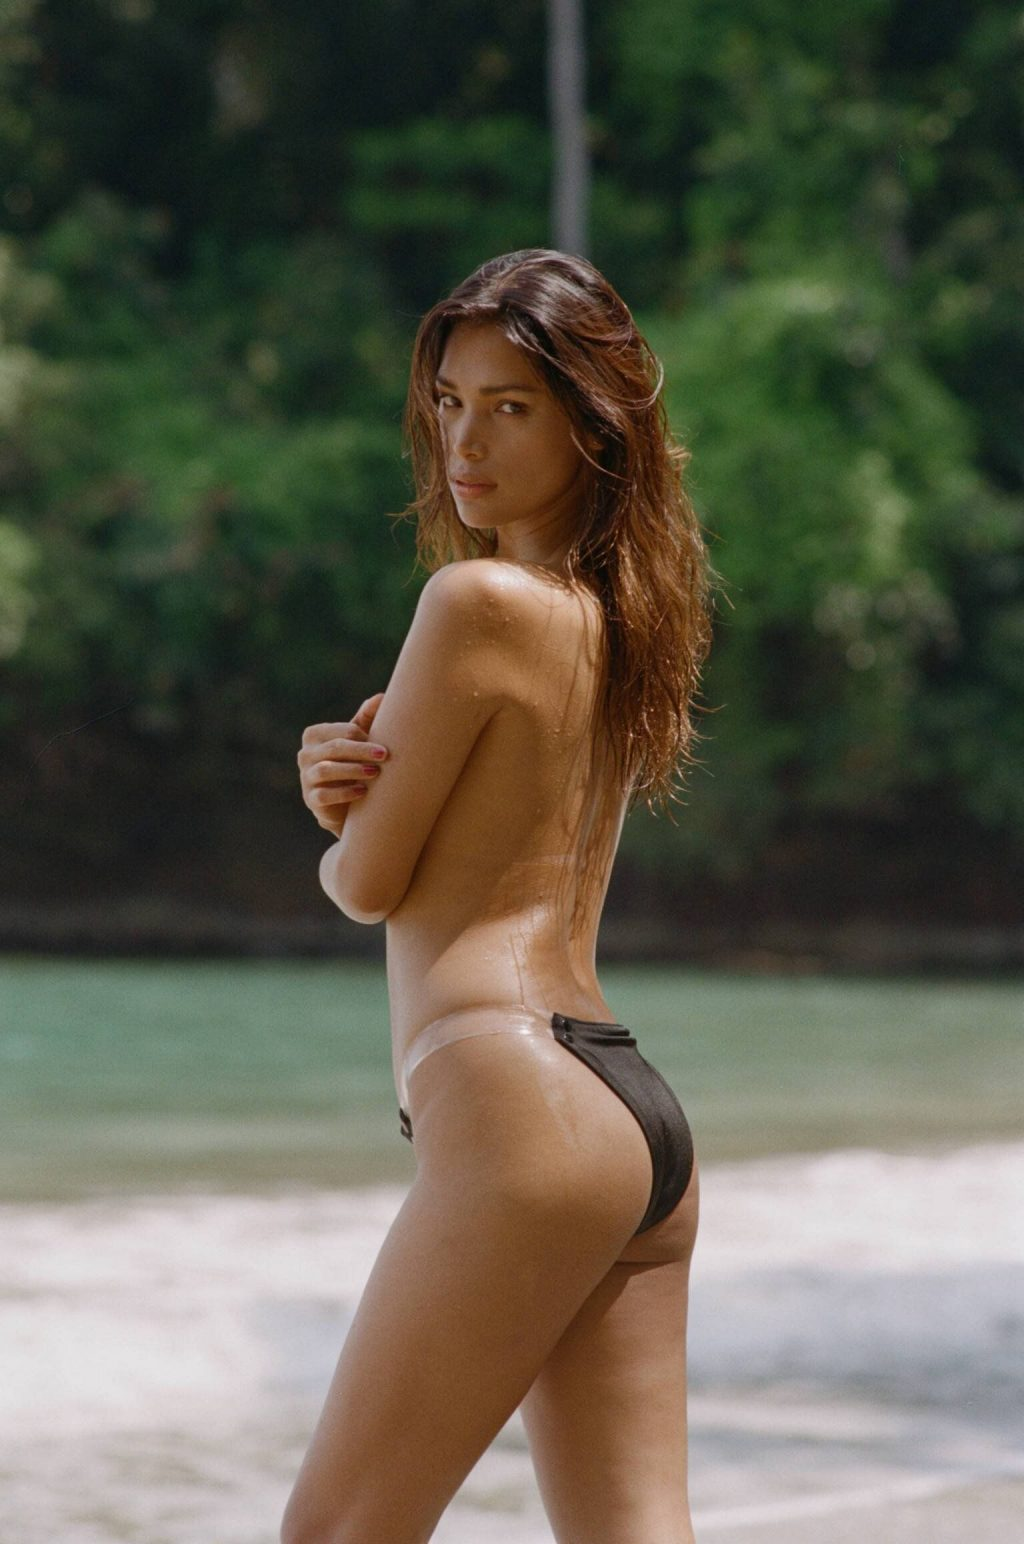 Geena Rocero Topless (5 Photos)